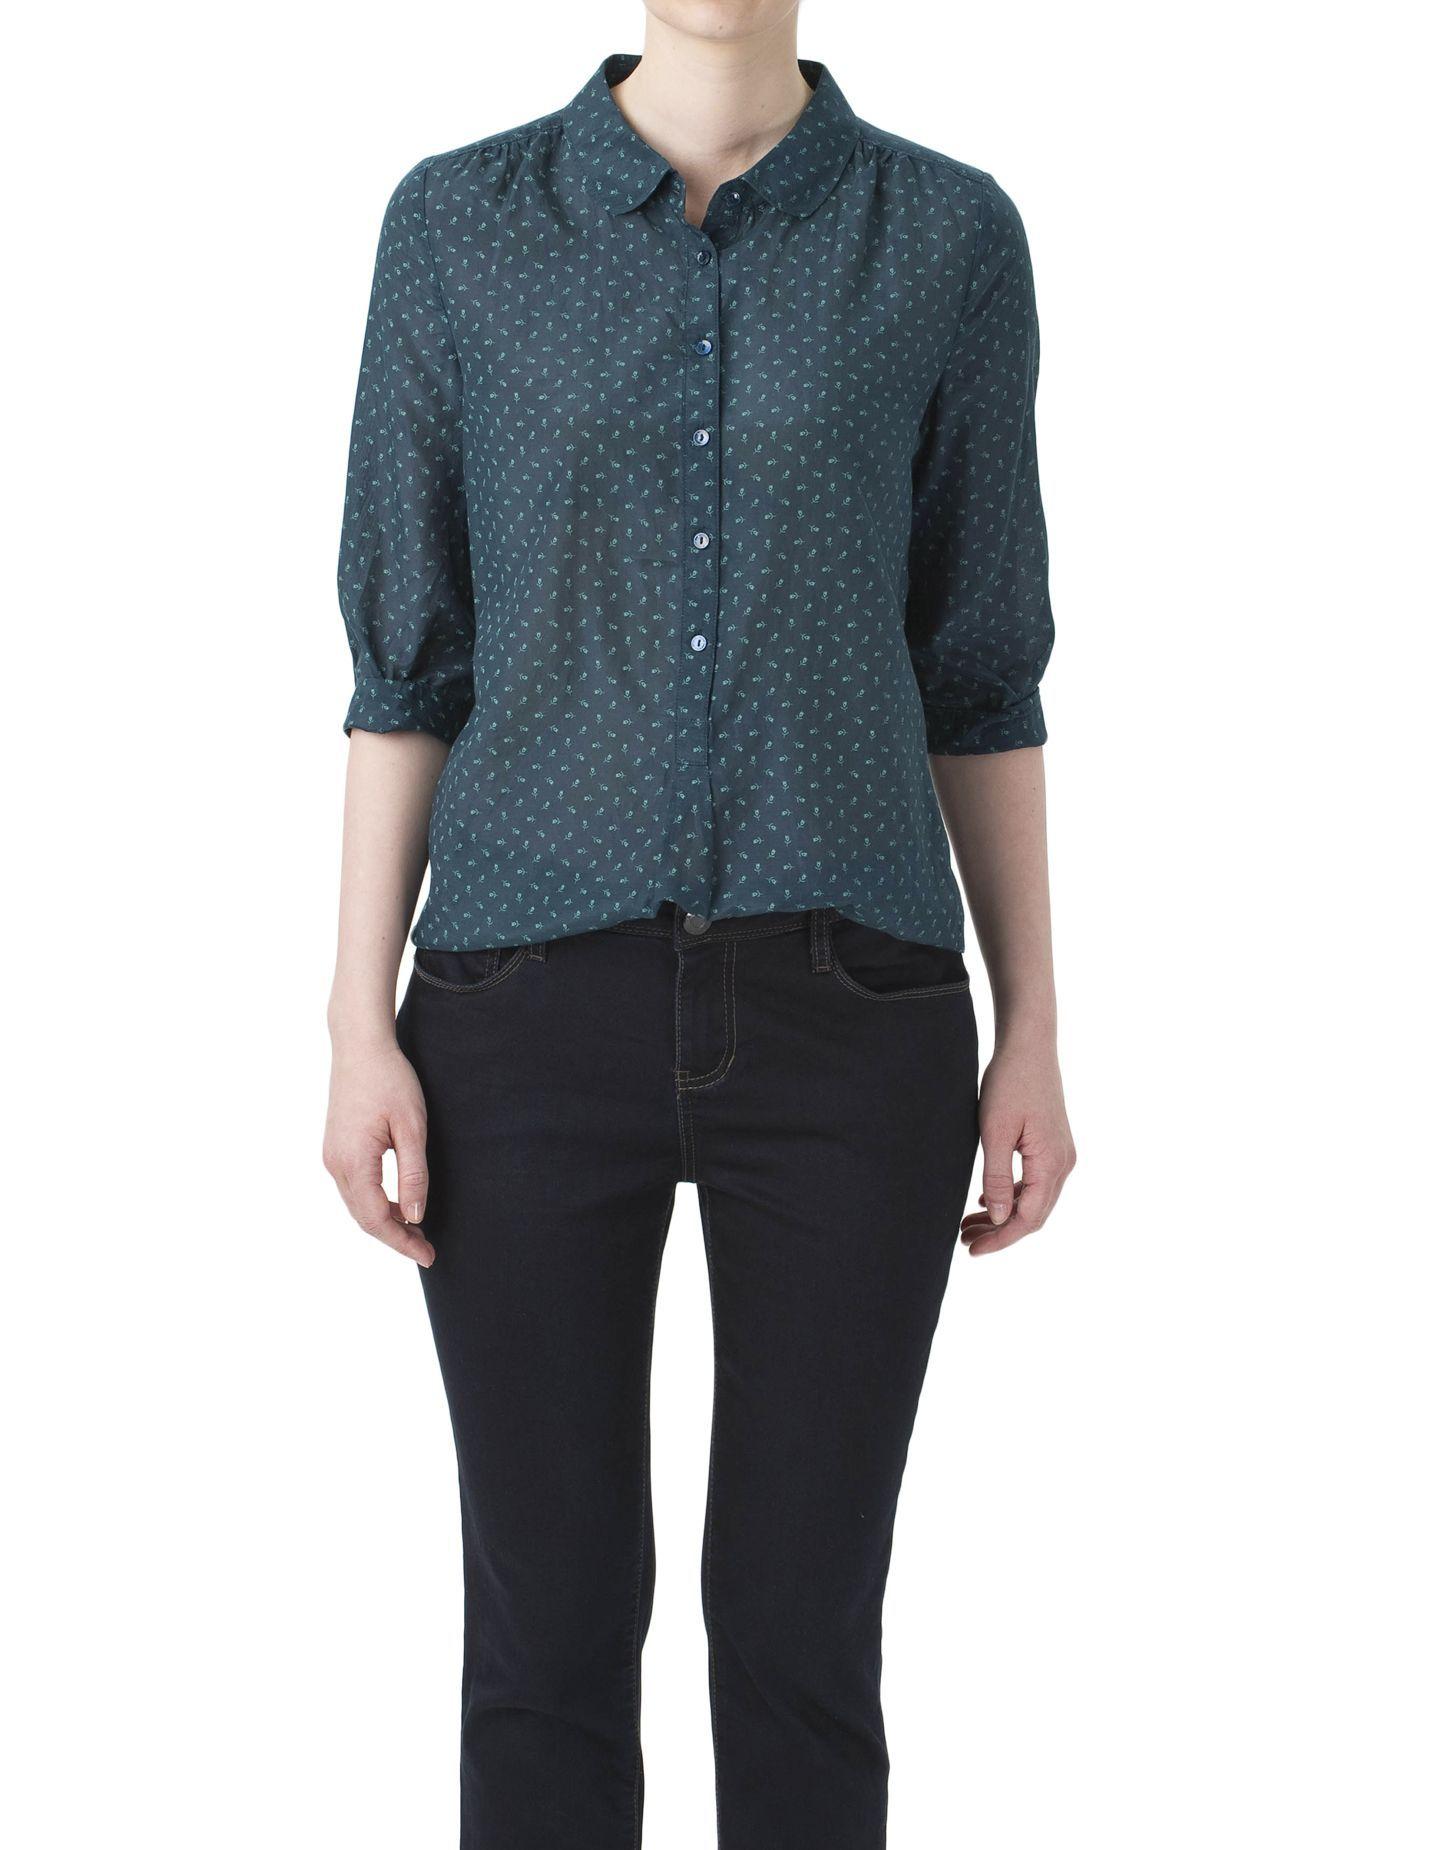 #blouses #opus | Kleidung online kaufen, Modestil